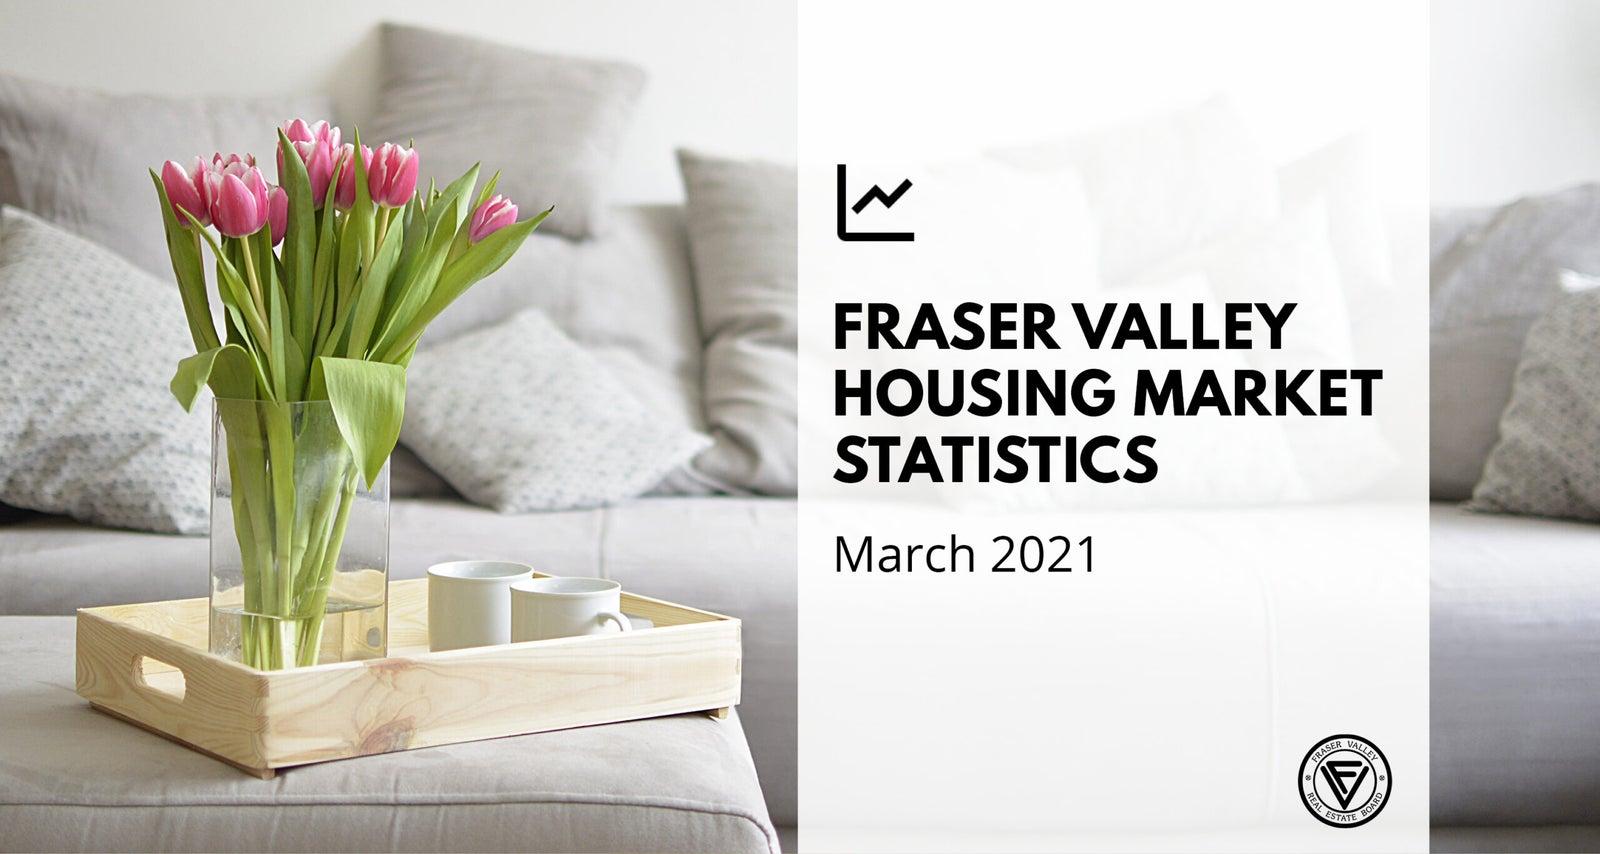 Fraser Valley Housing Market Statistics for March 2021